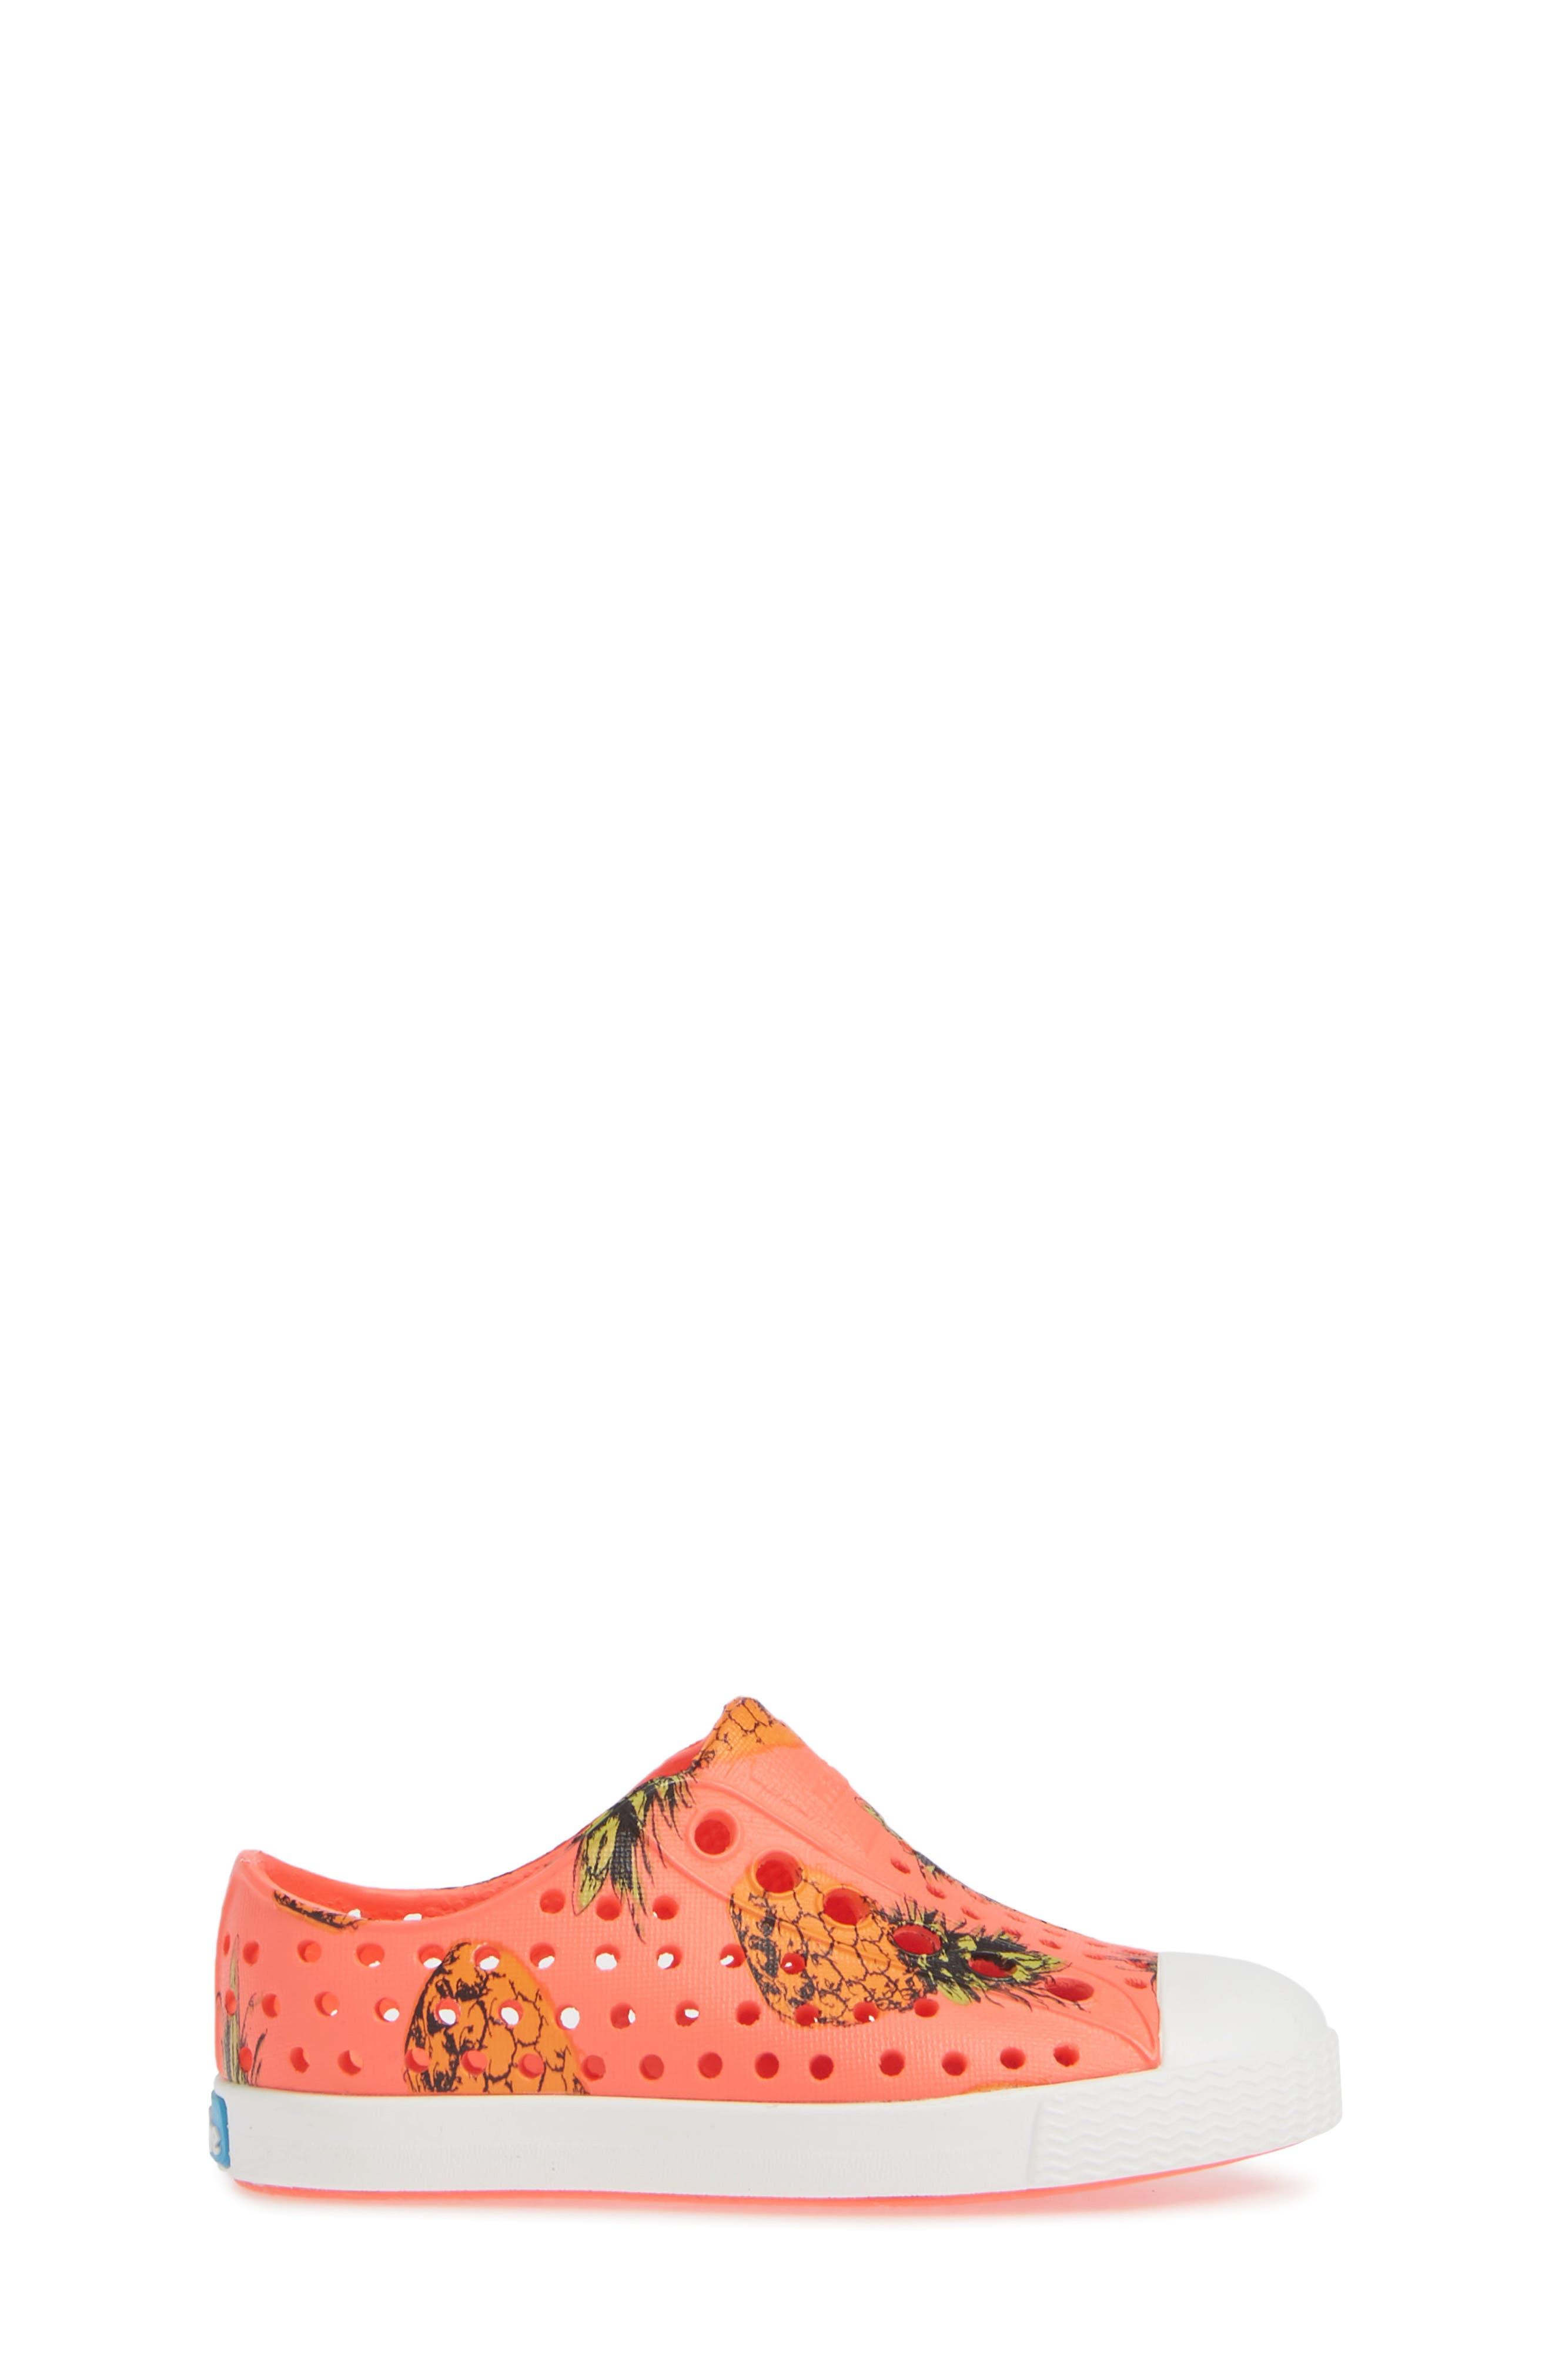 Jefferson Pineapple Print Water Friendly Sneaker,                             Alternate thumbnail 3, color,                             POPSTAR PINK/ WHITE PINEAPPLES